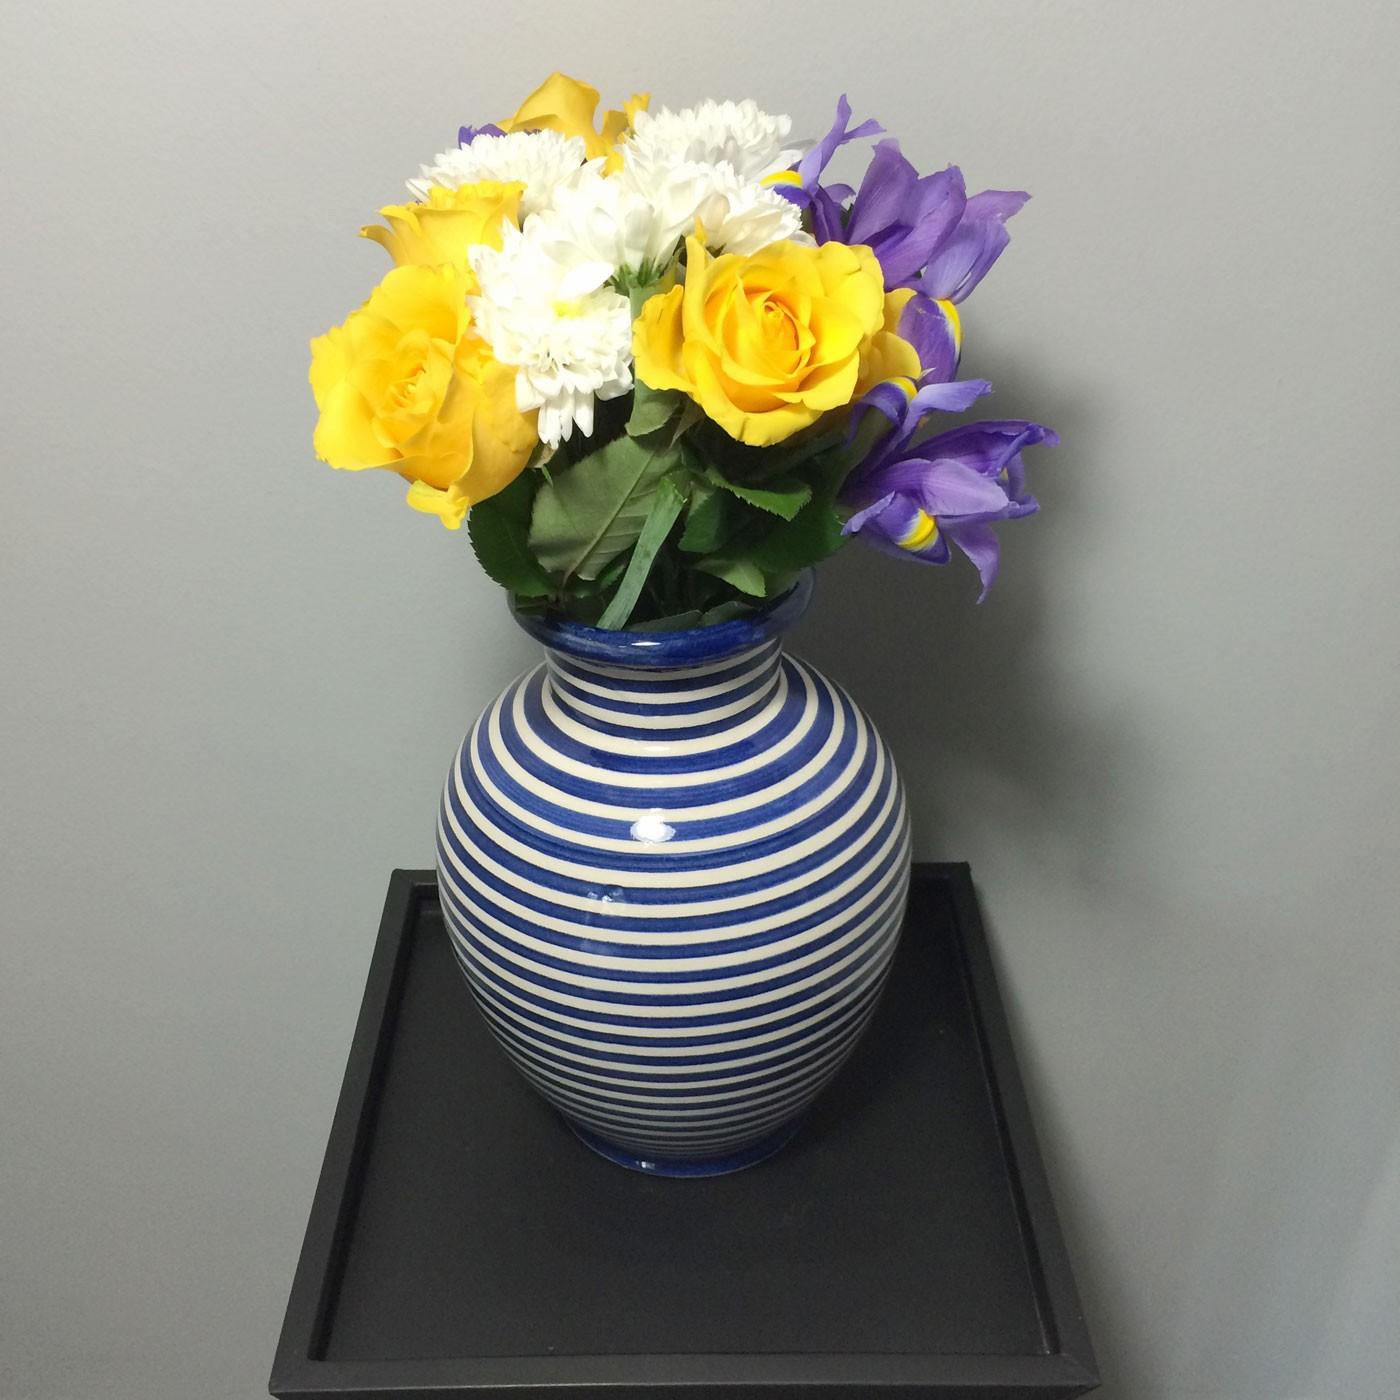 vase decoratif ikea 10 univers blancs vases et cache pots. Black Bedroom Furniture Sets. Home Design Ideas